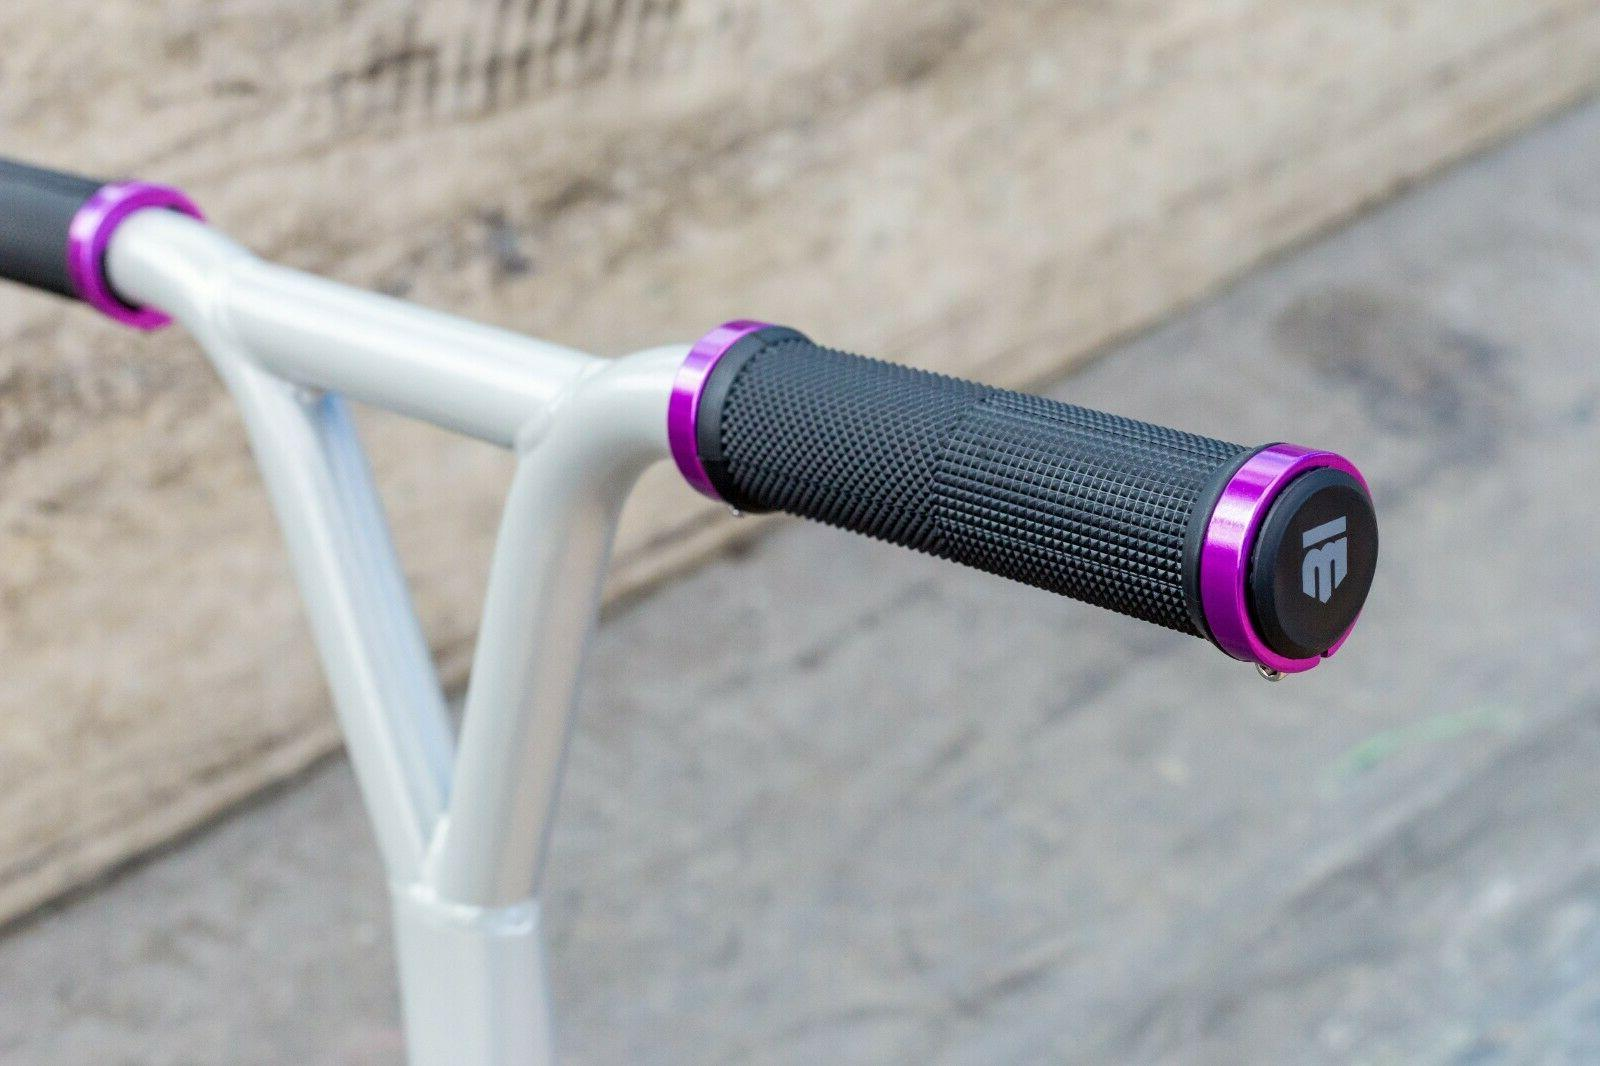 NEW Stance Lightweight Scooter - Purple/Gray